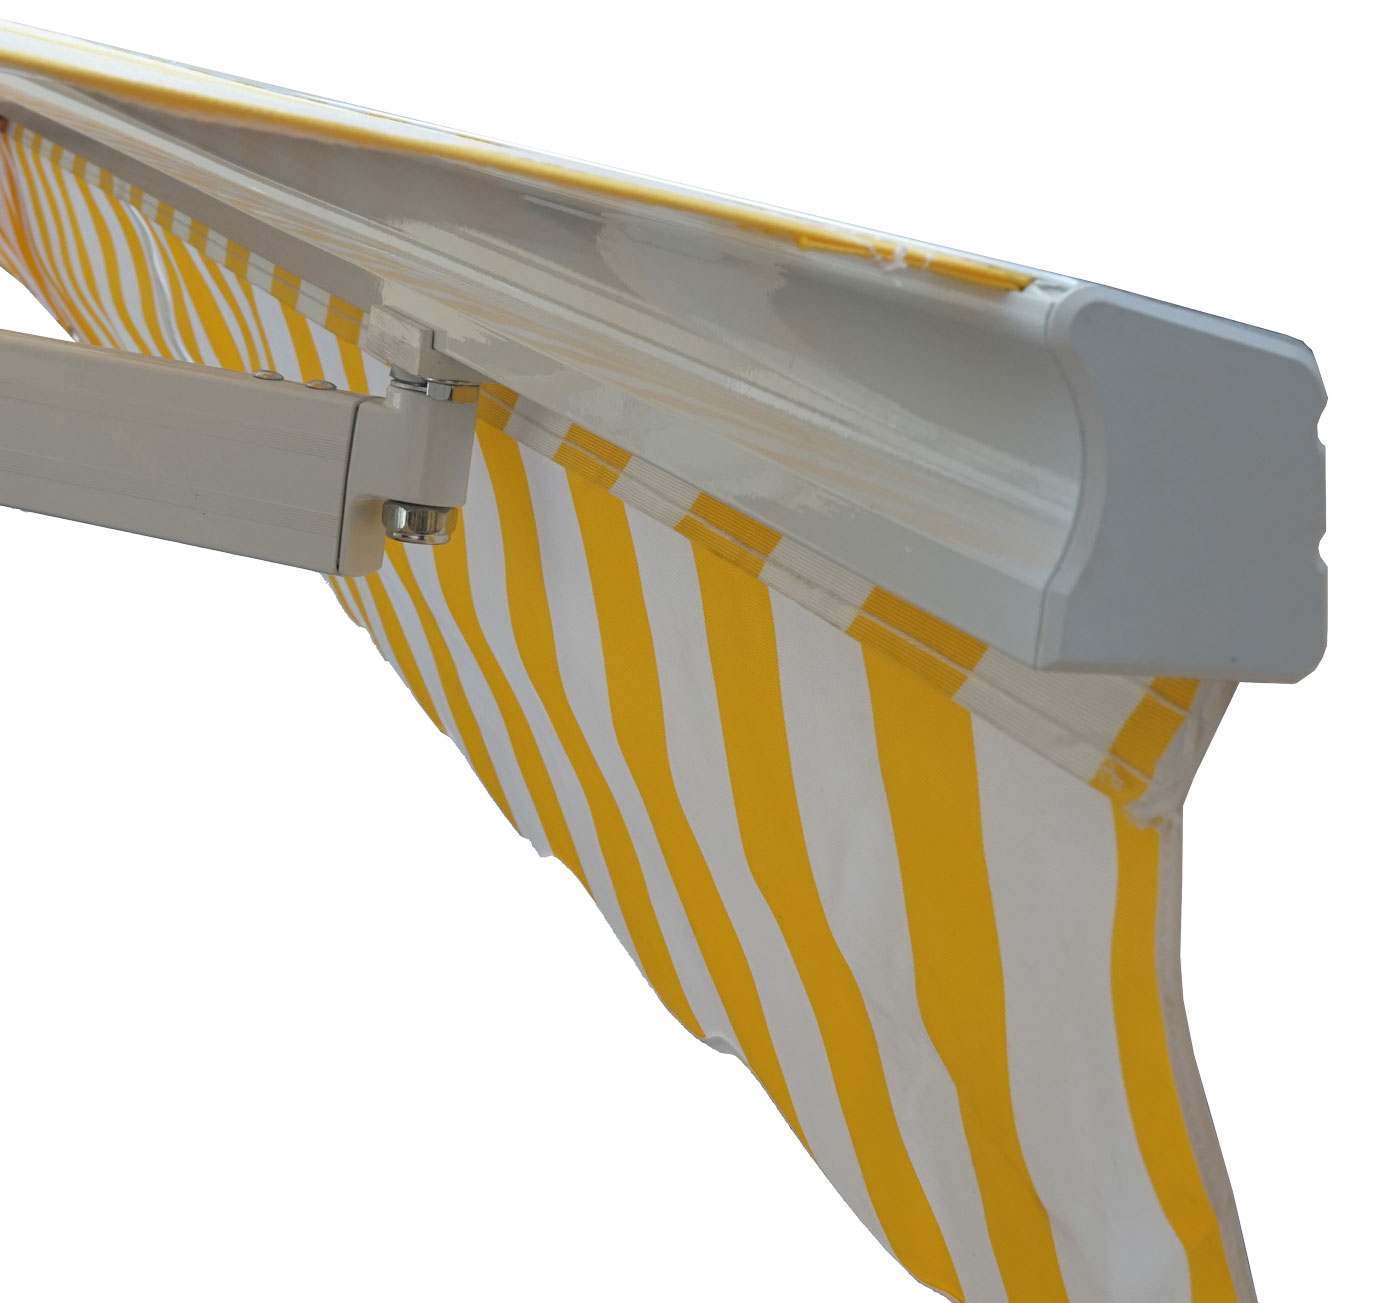 Polyester terrakotta Alu-Markise MCW-E31 Gelenkarmmarkise Sonnenschutz 3x2,5m